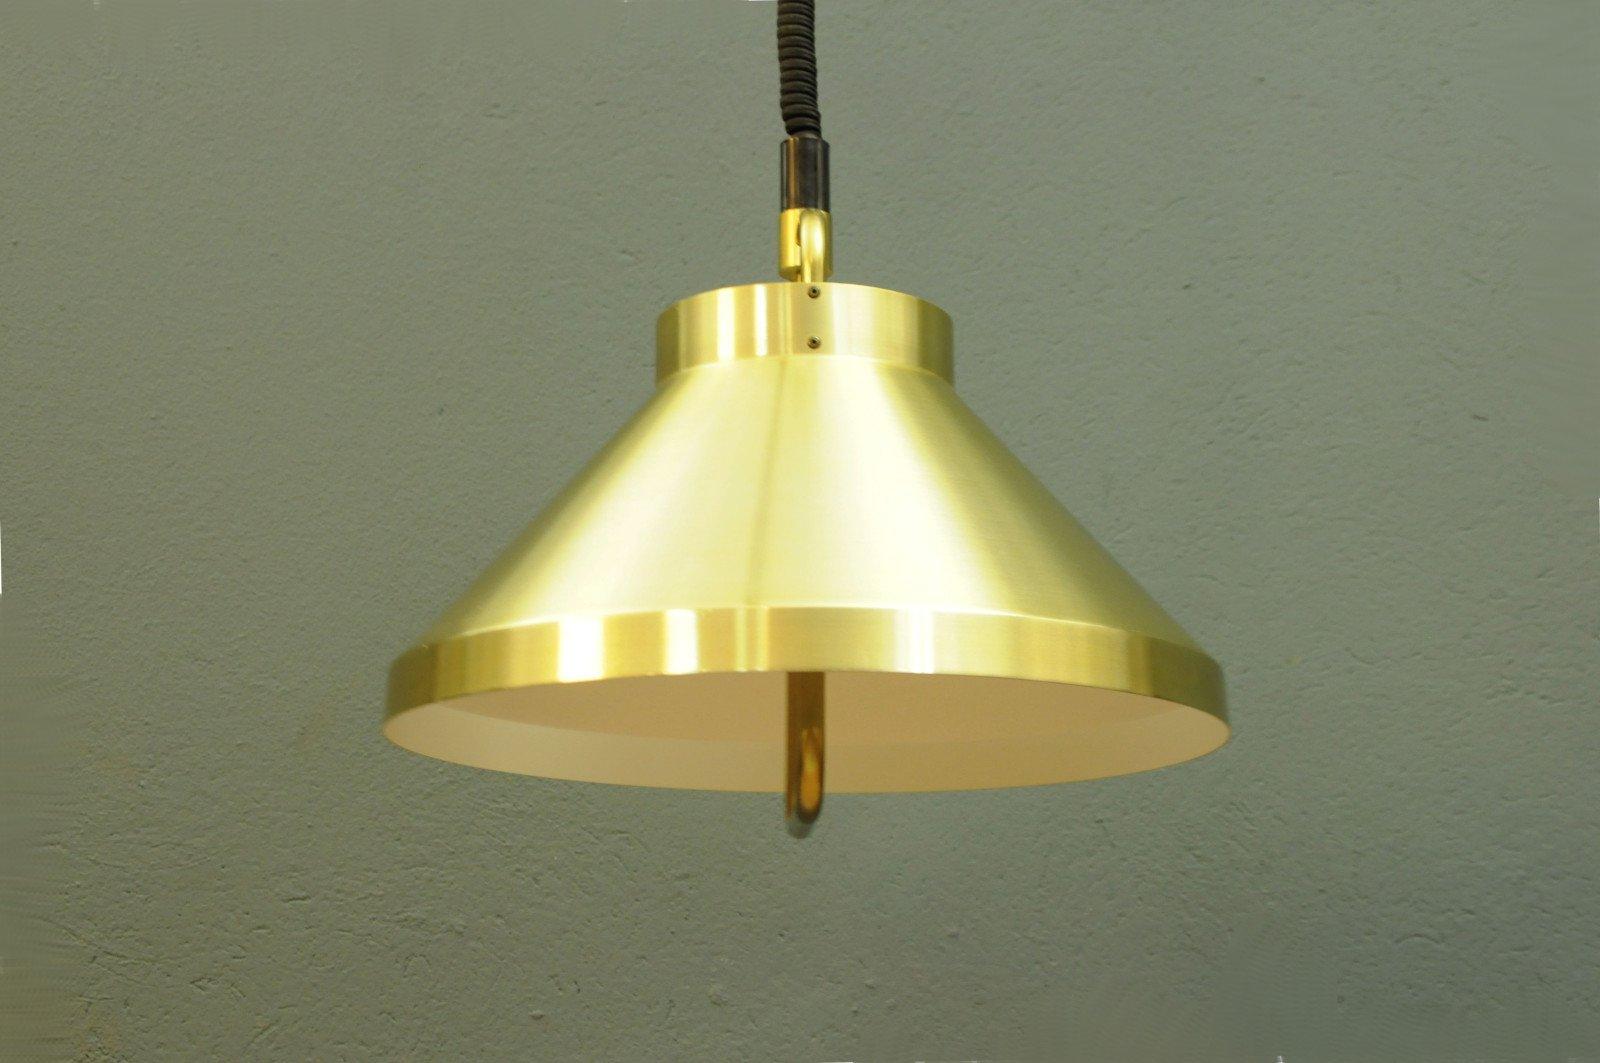 Lampade A Sospensione Vintage : Lampada a sospensione vintage dorata di belid anni 60 in vendita